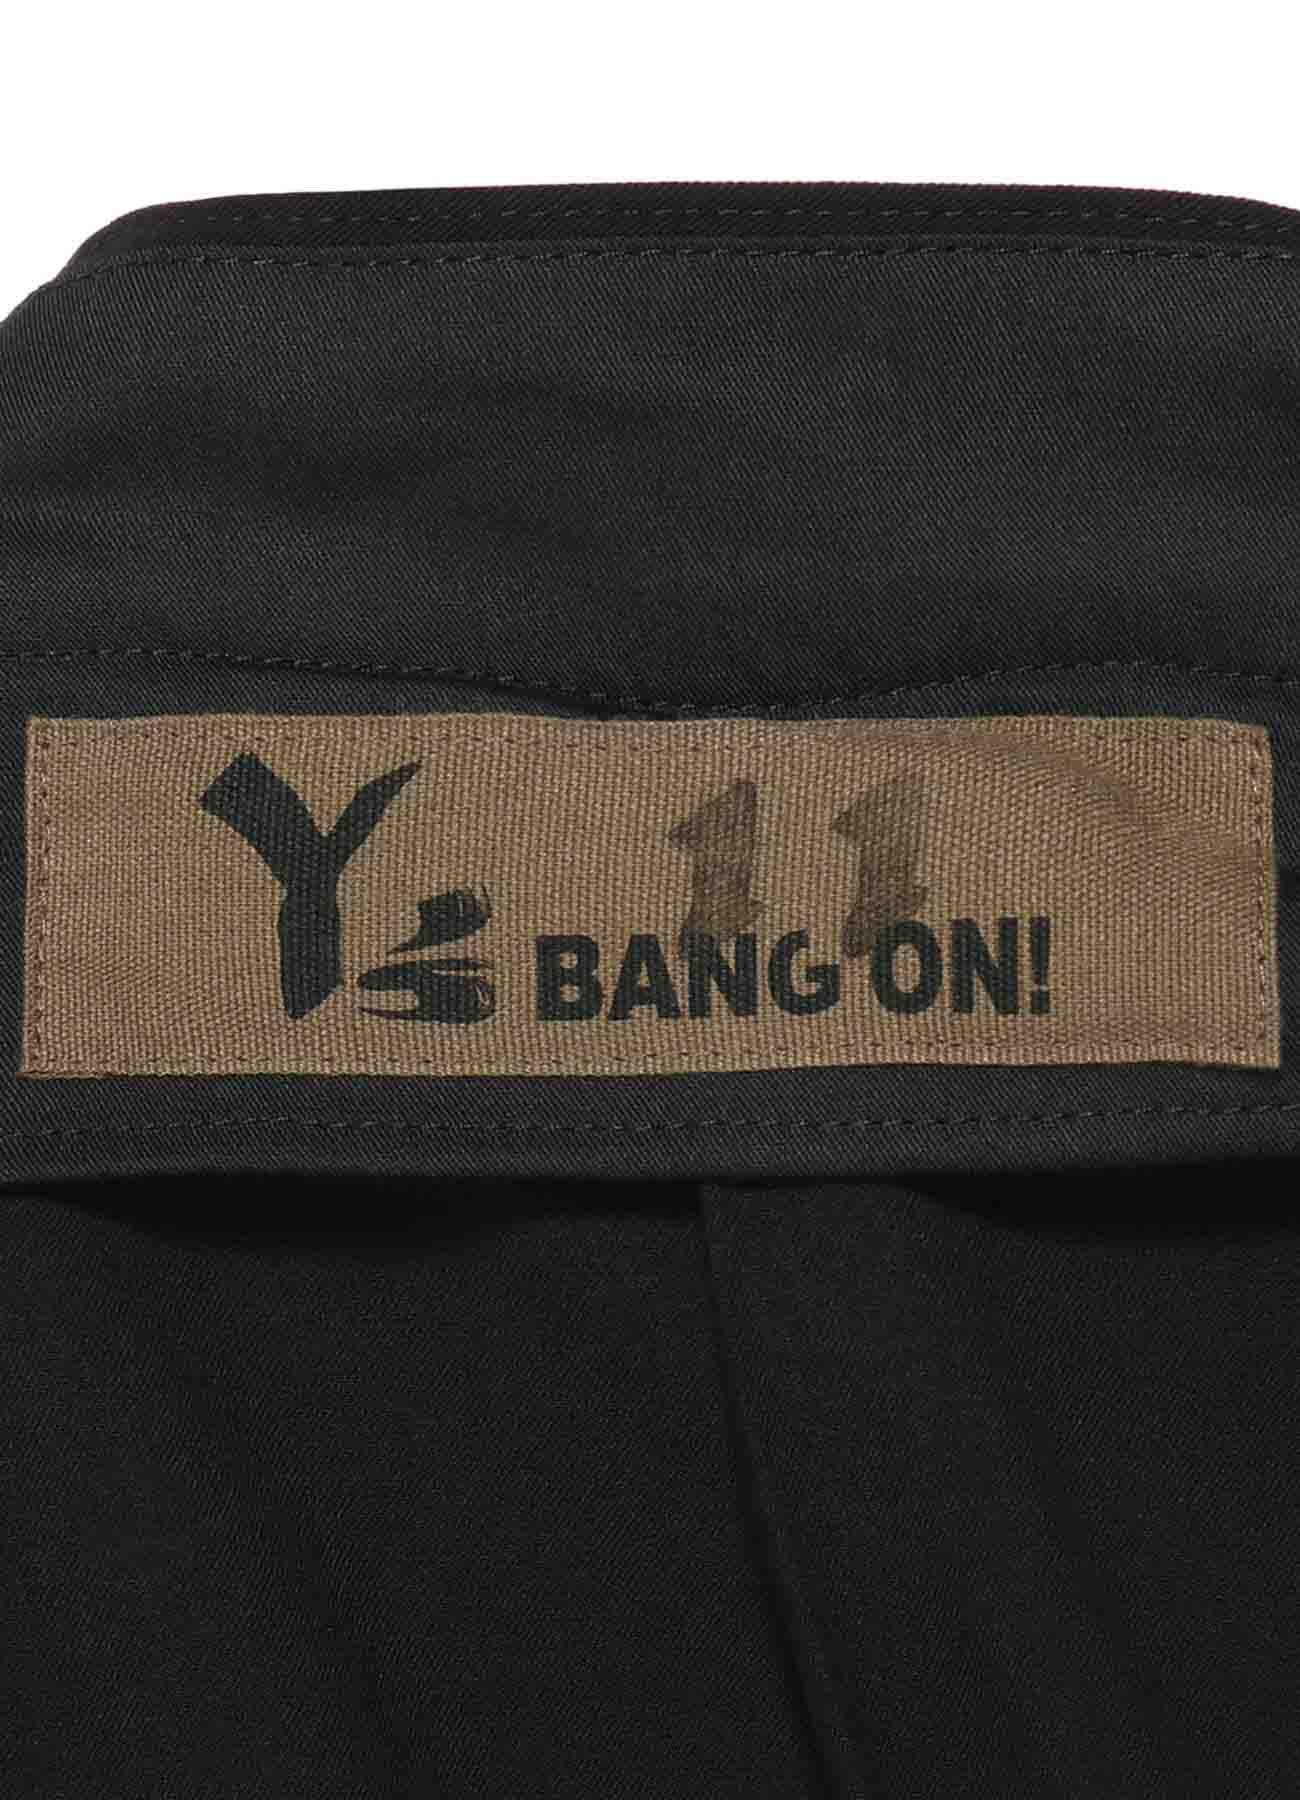 Y's BANG ON!No.11 Pleats pants Stretch gabardine